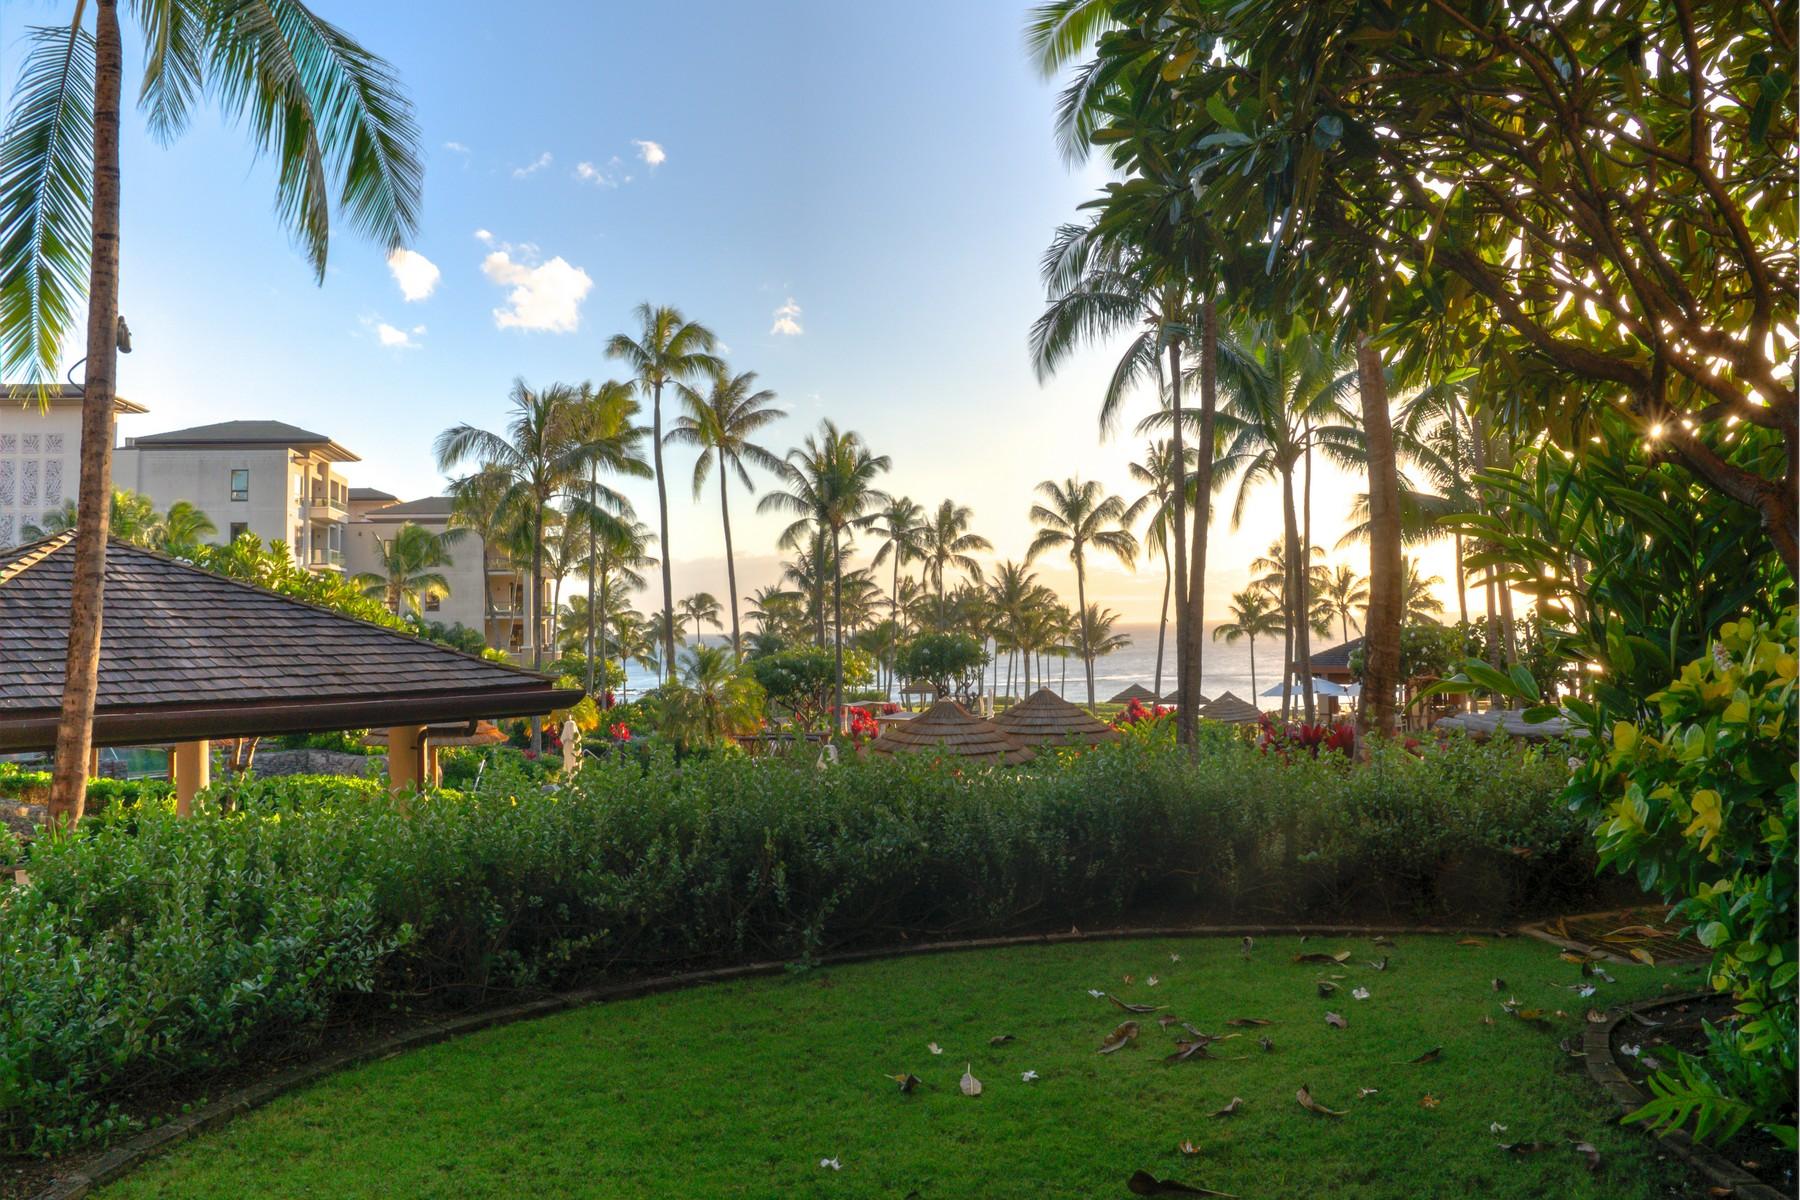 Propriedades individuais para Venda às Montage Fractional 1 Bay Drive, Montage Residences 4102 Kapalua, Havaí, 96761 Estados Unidos